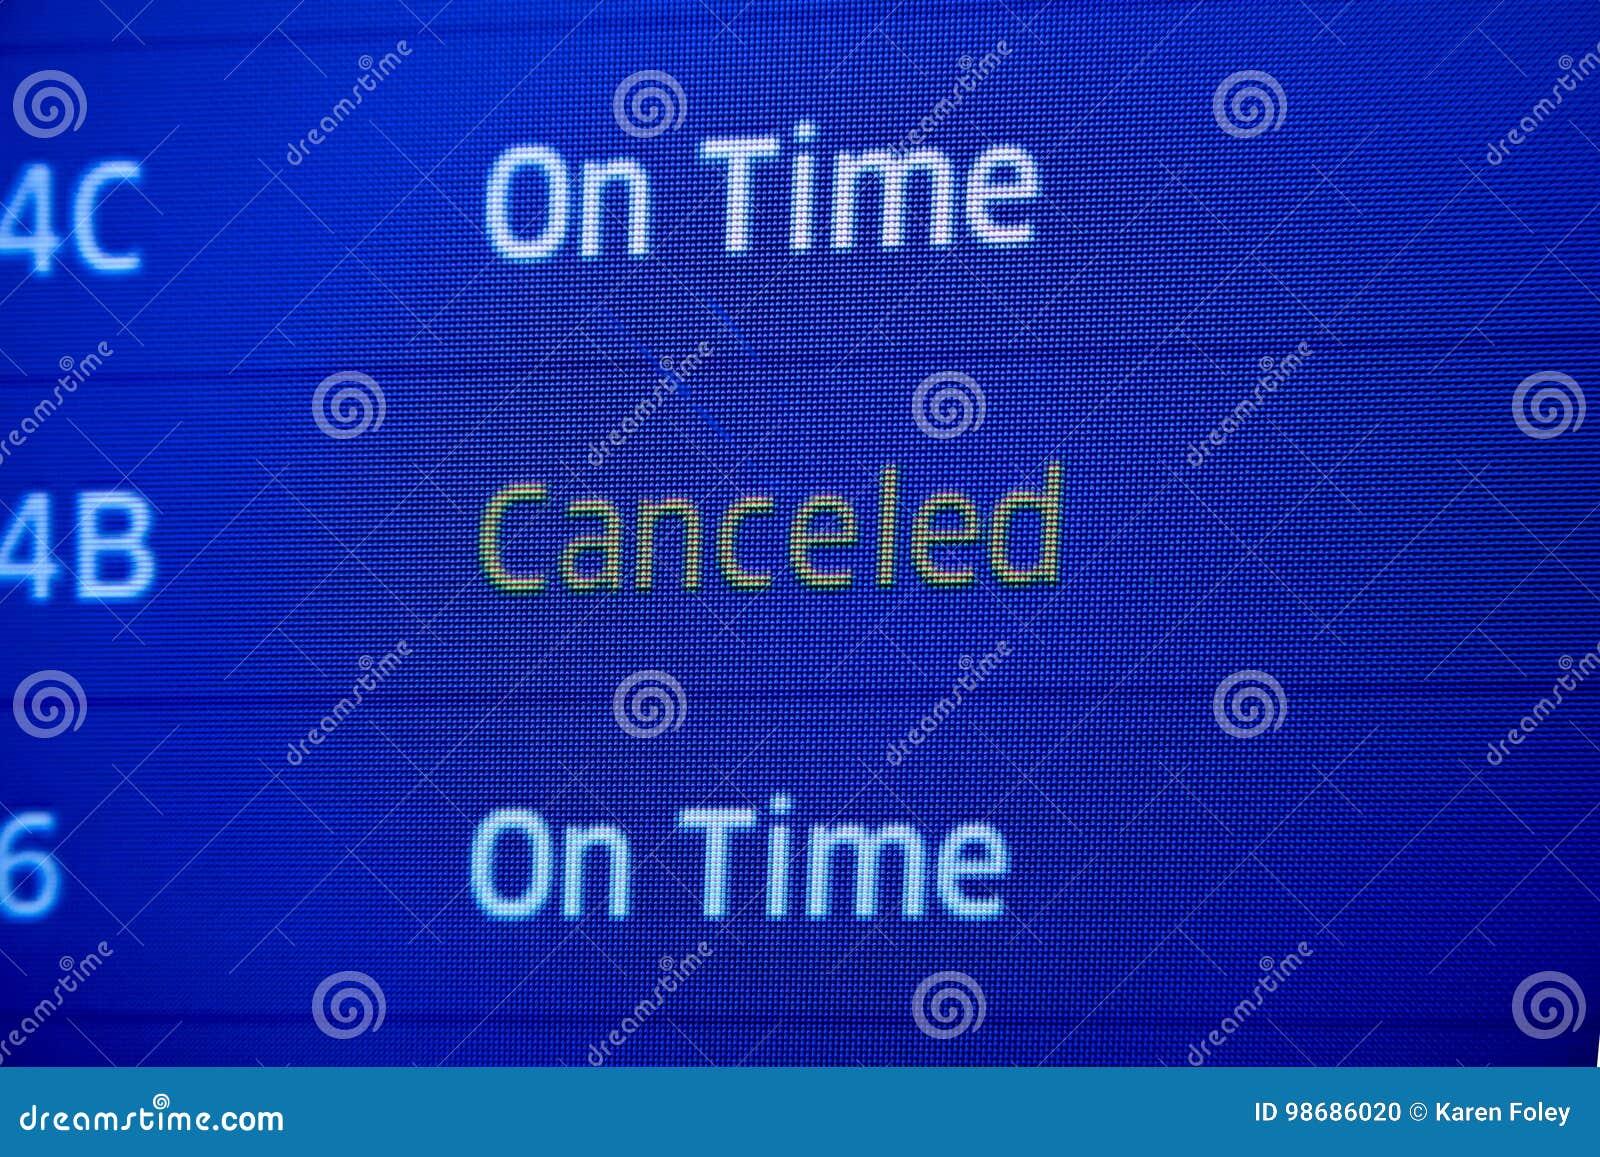 Canceled fllight status